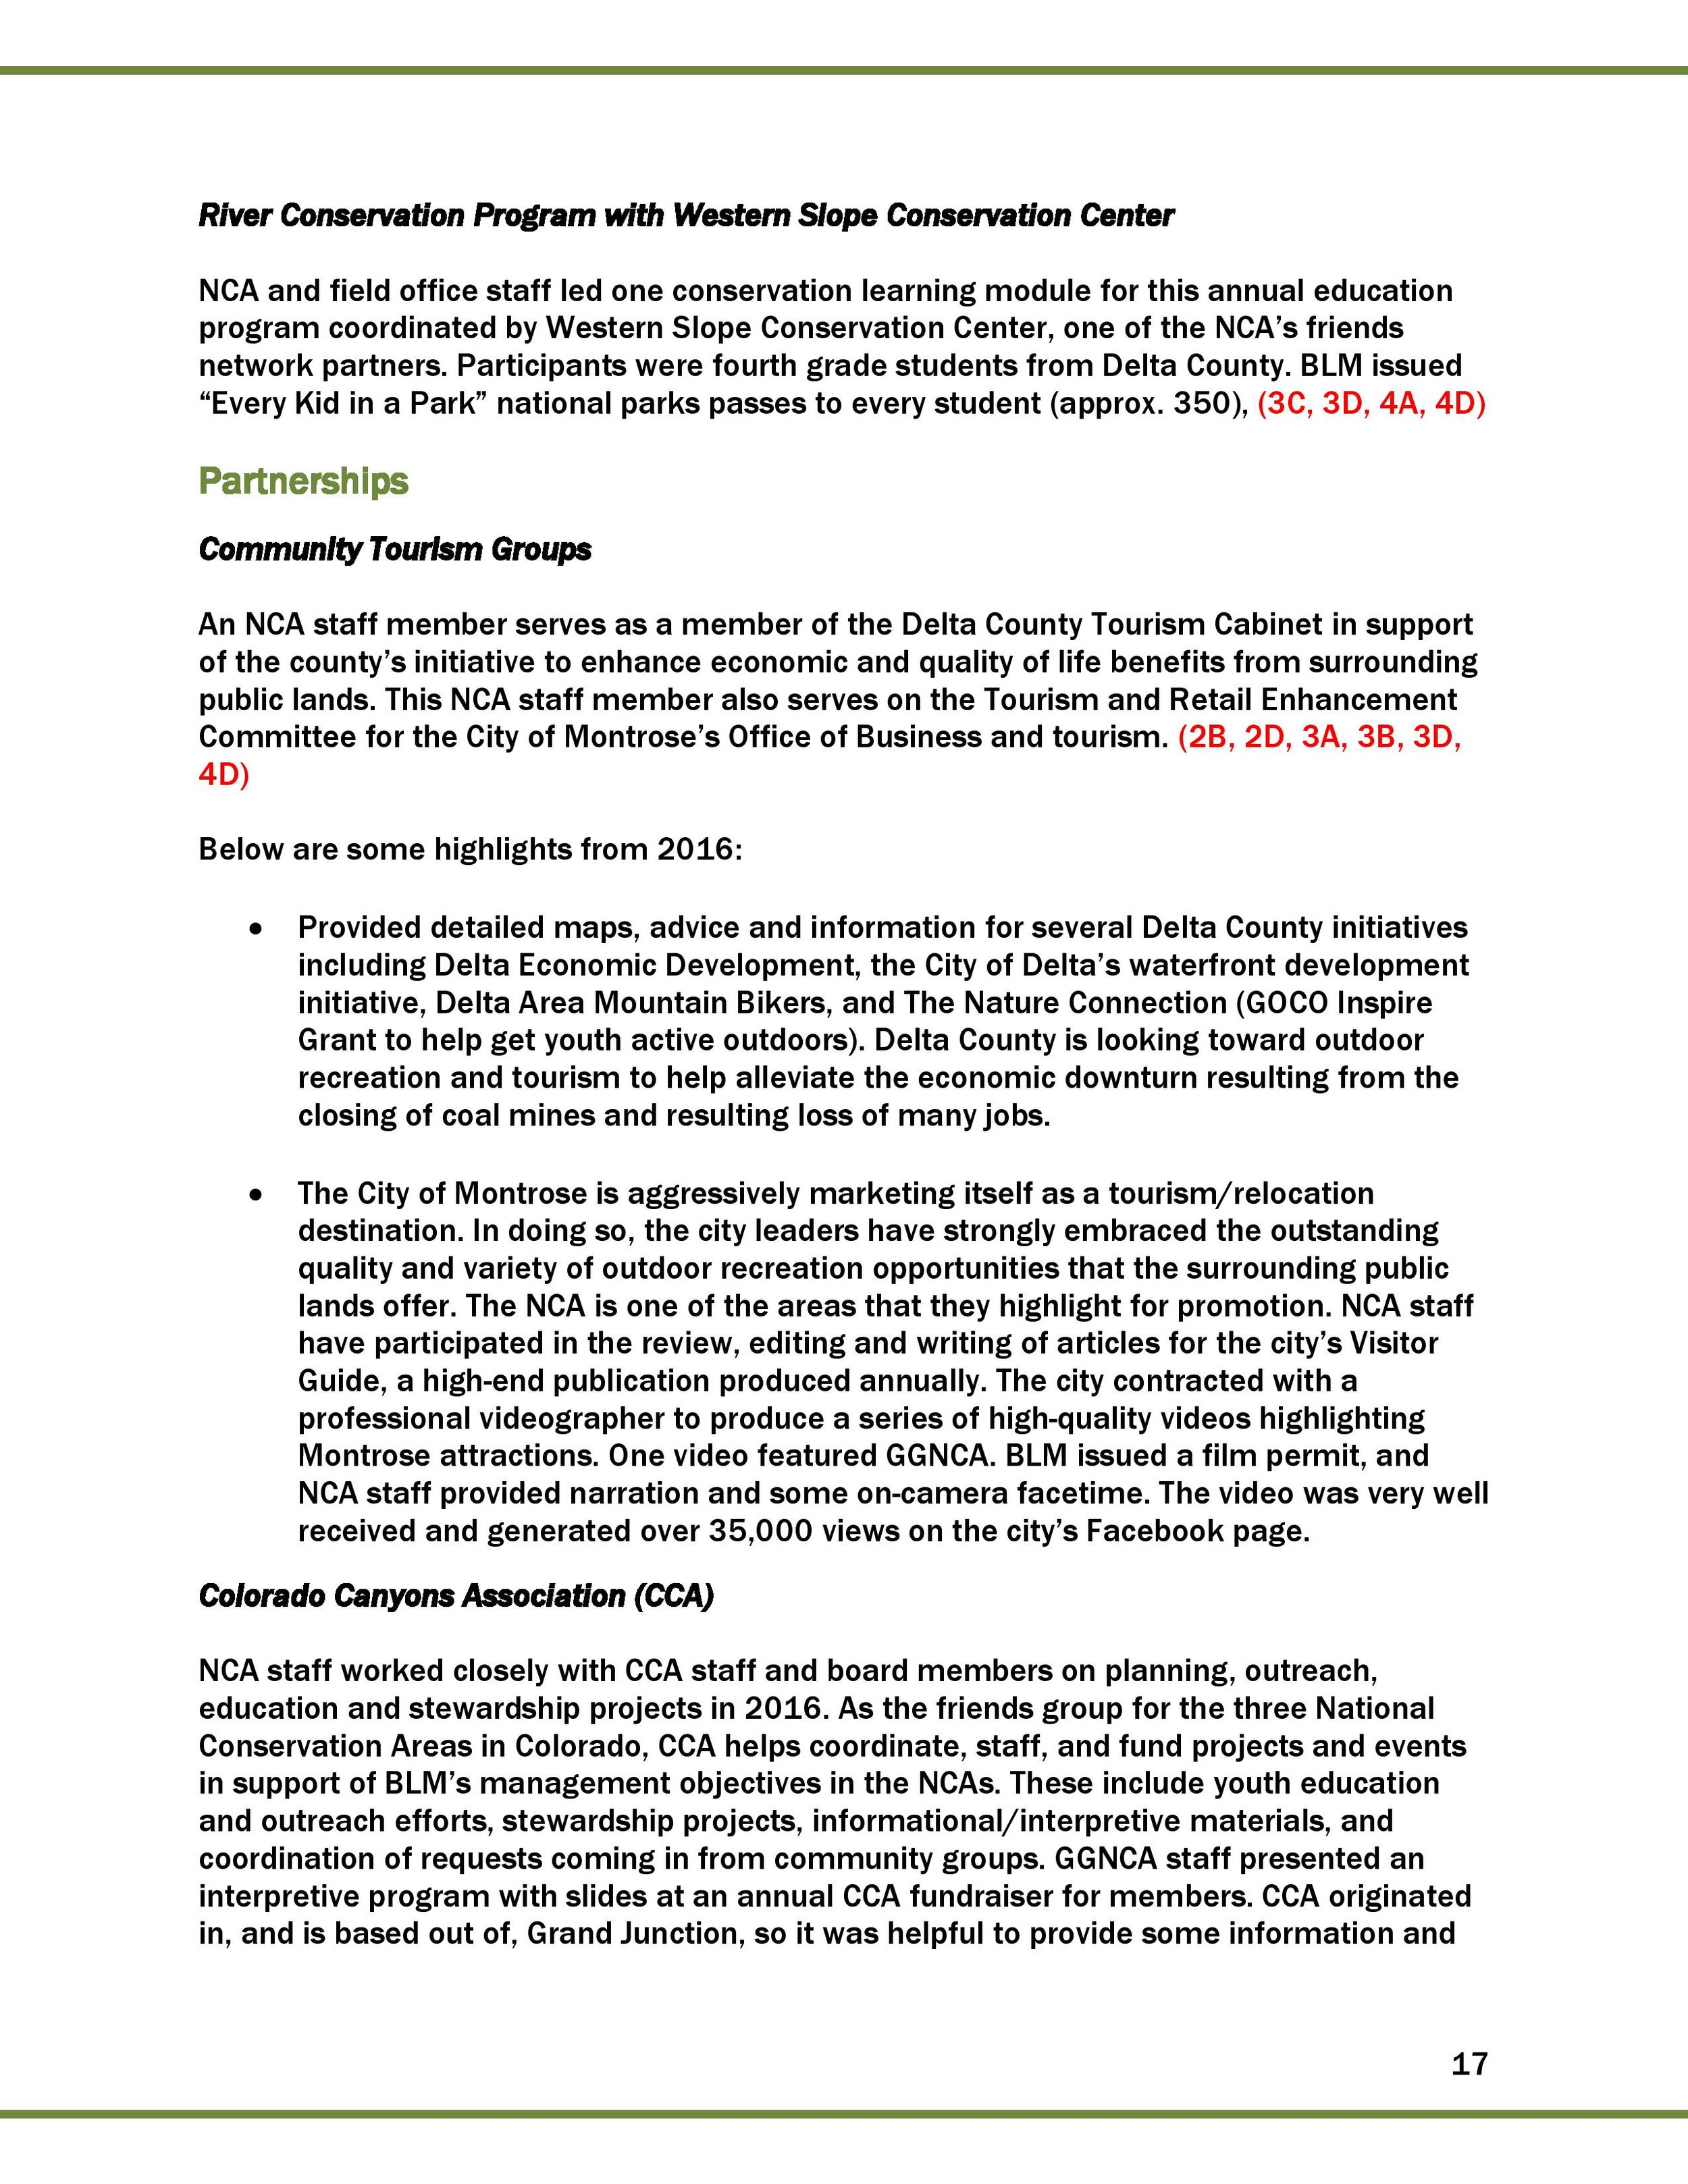 2016 FINAL GGNCA REPORT_2017_02_01-page-018.jpg